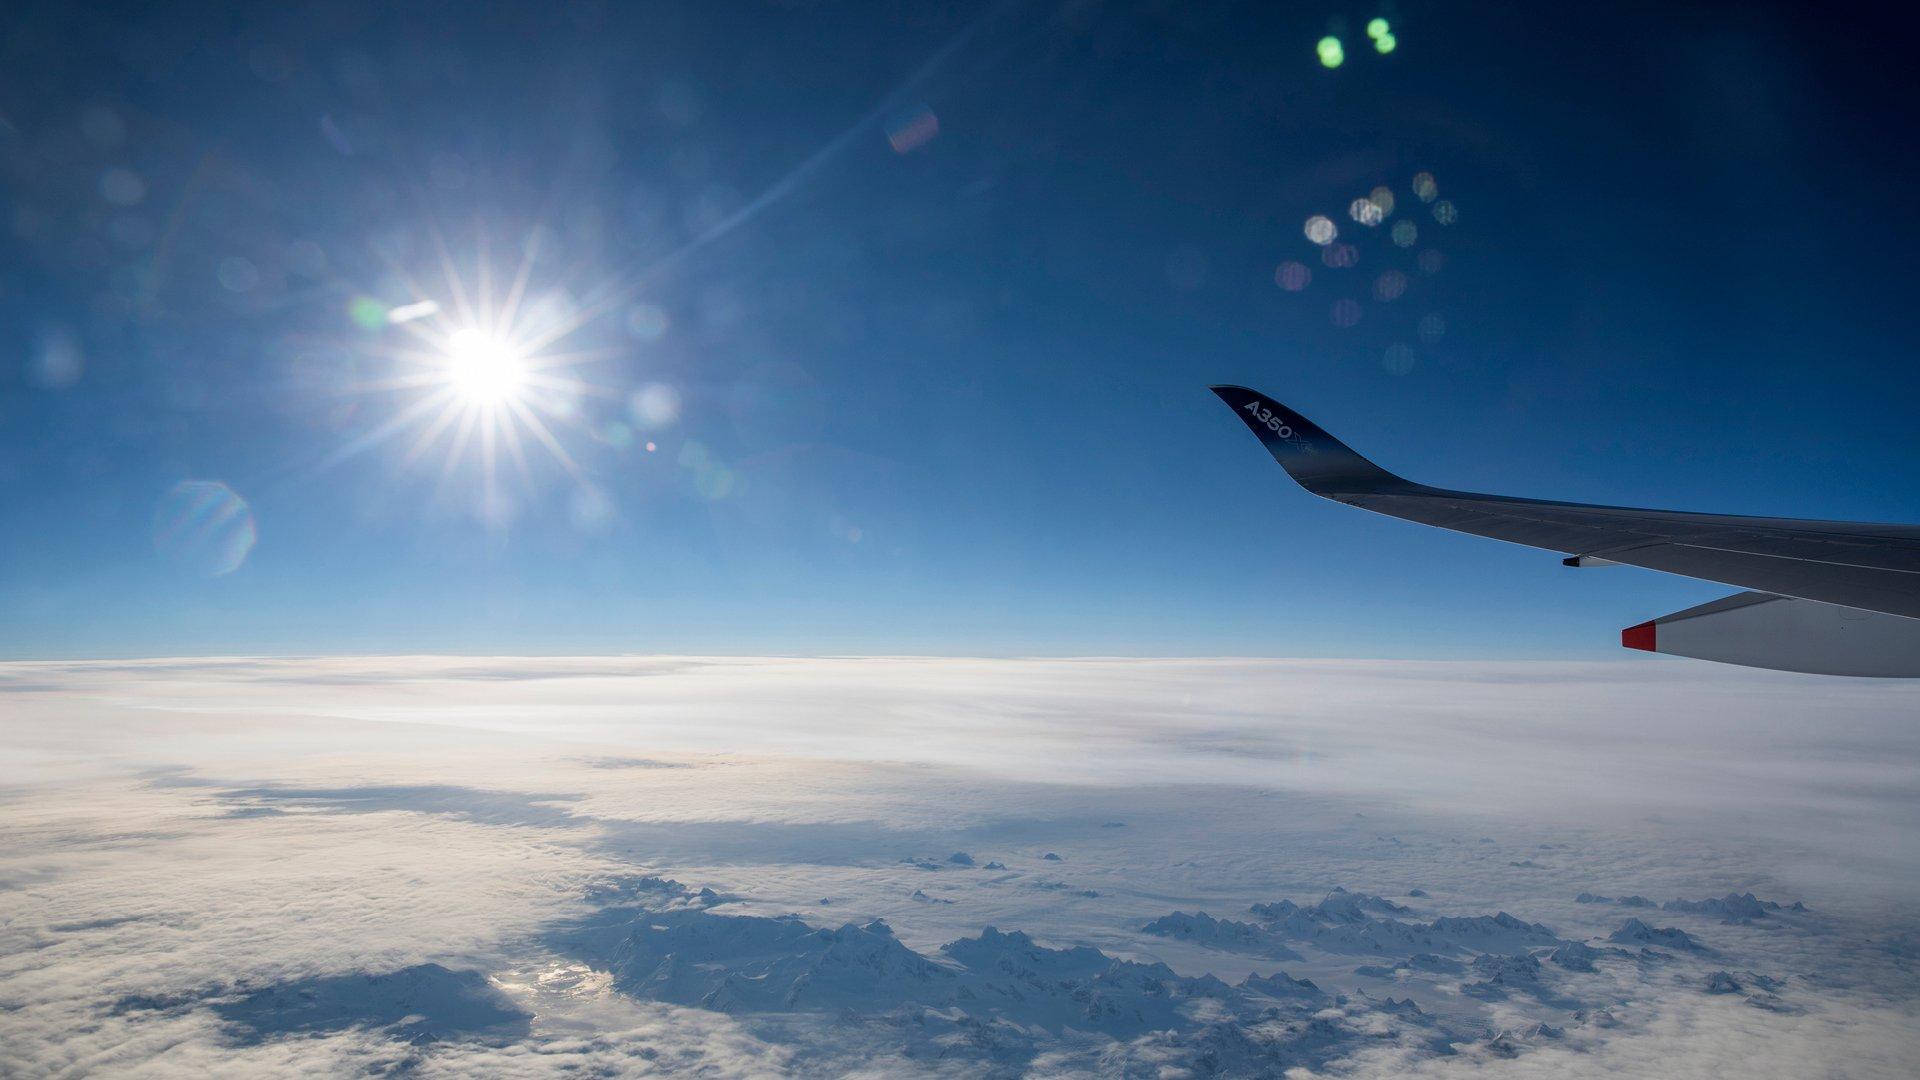 Making net-zero-carbon aviation a reality